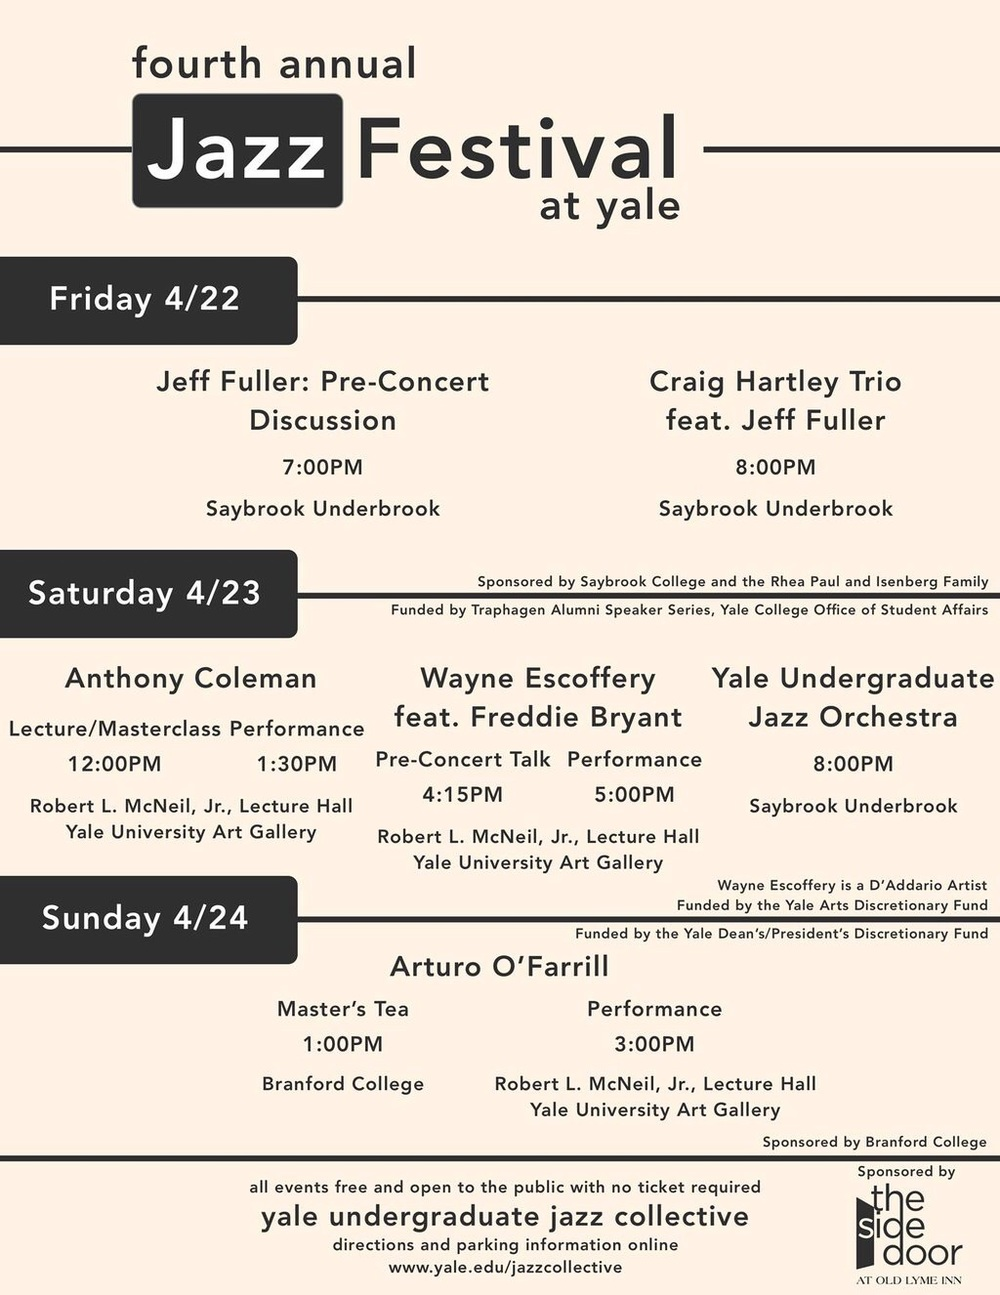 www.yale.edu/jazzcollective